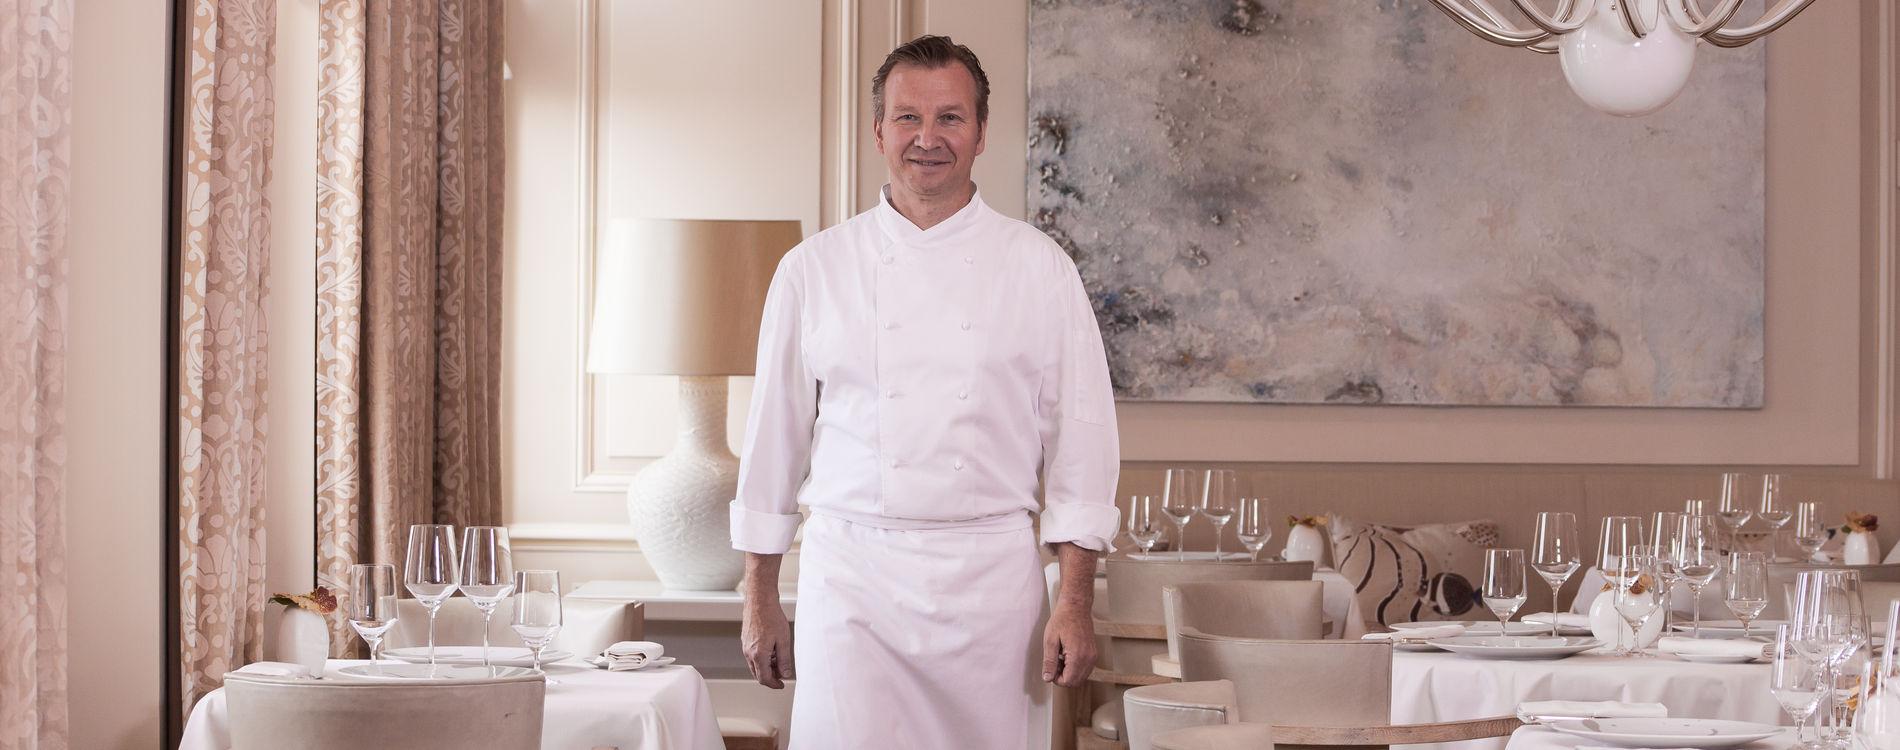 Hôtel Hermitage - Chef Benoît Witz